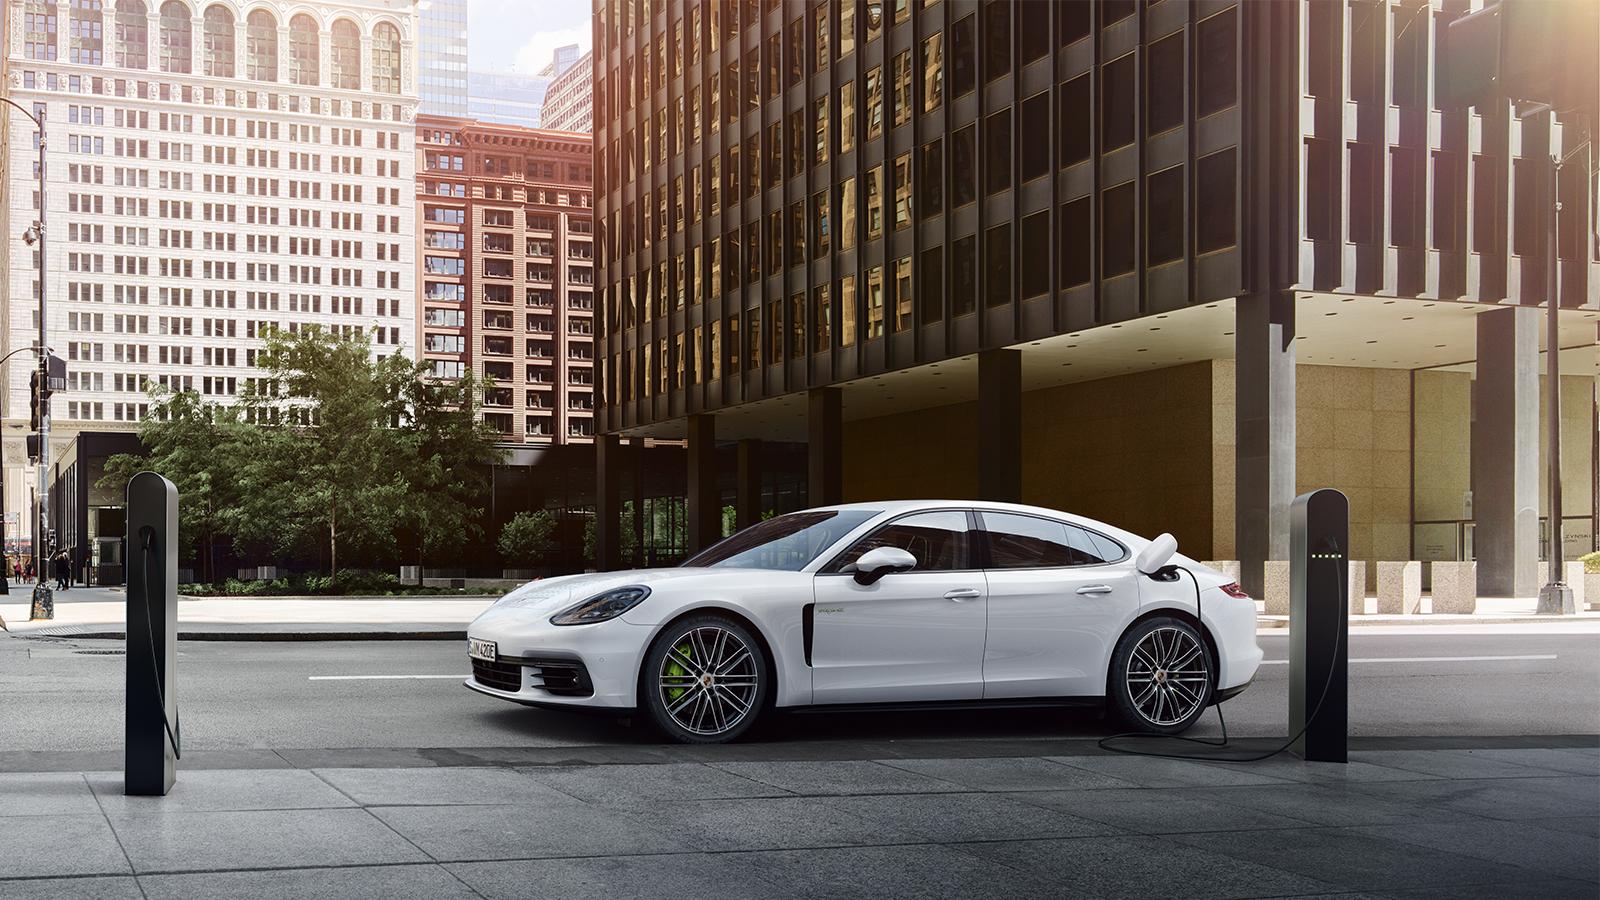 Porsche Энергия